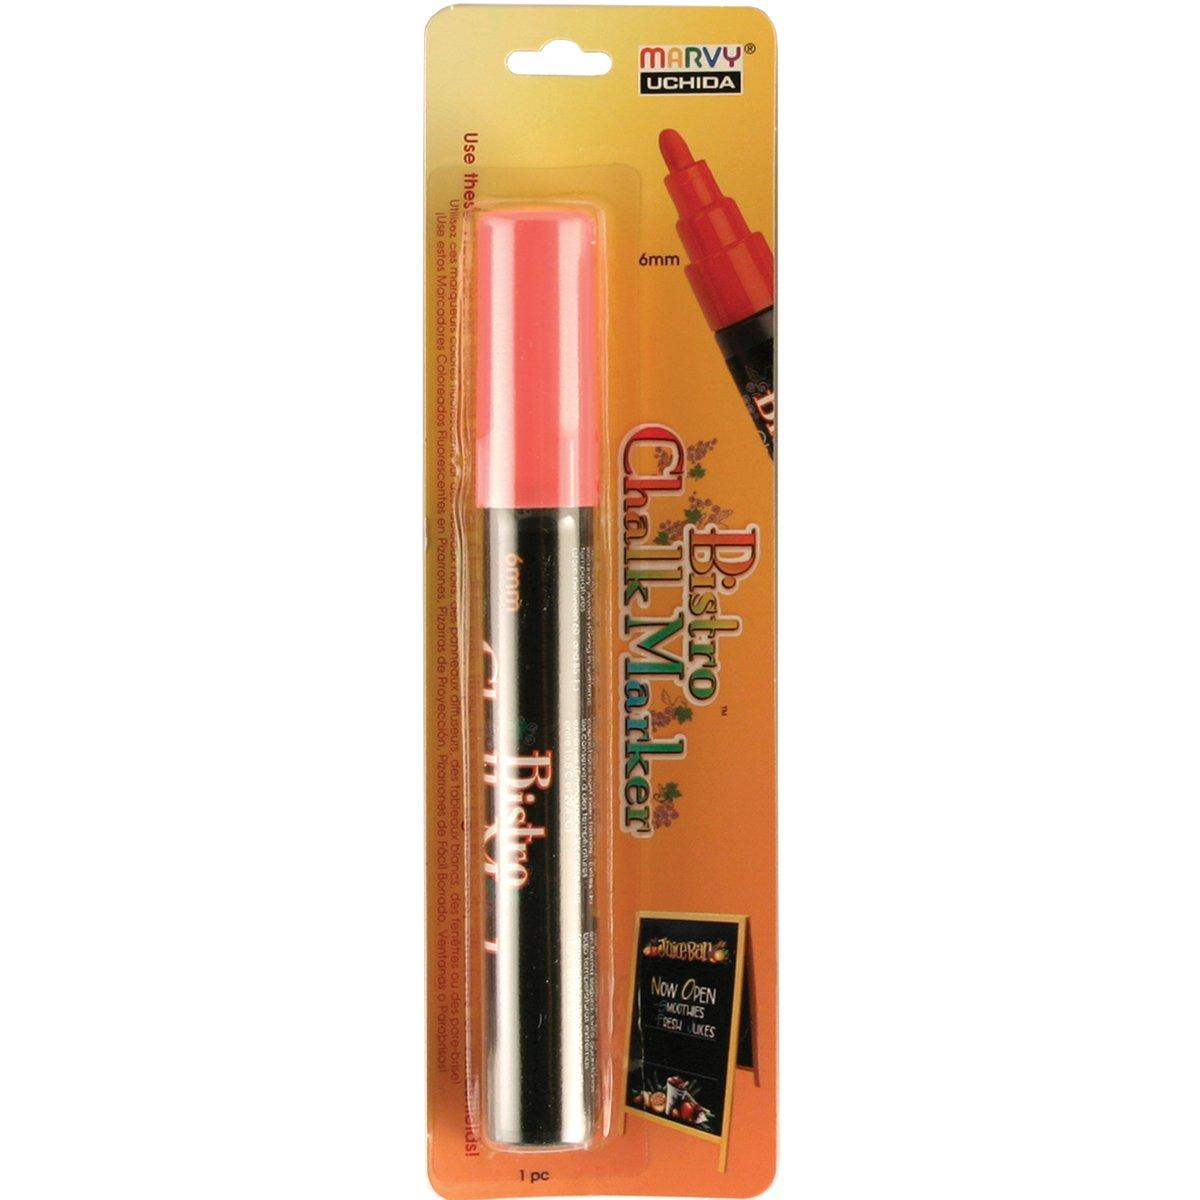 Uchida 480-C-0 Marvy Broad Point Tip Regular Bistro Chalk Marker, White Uchida of America Corp